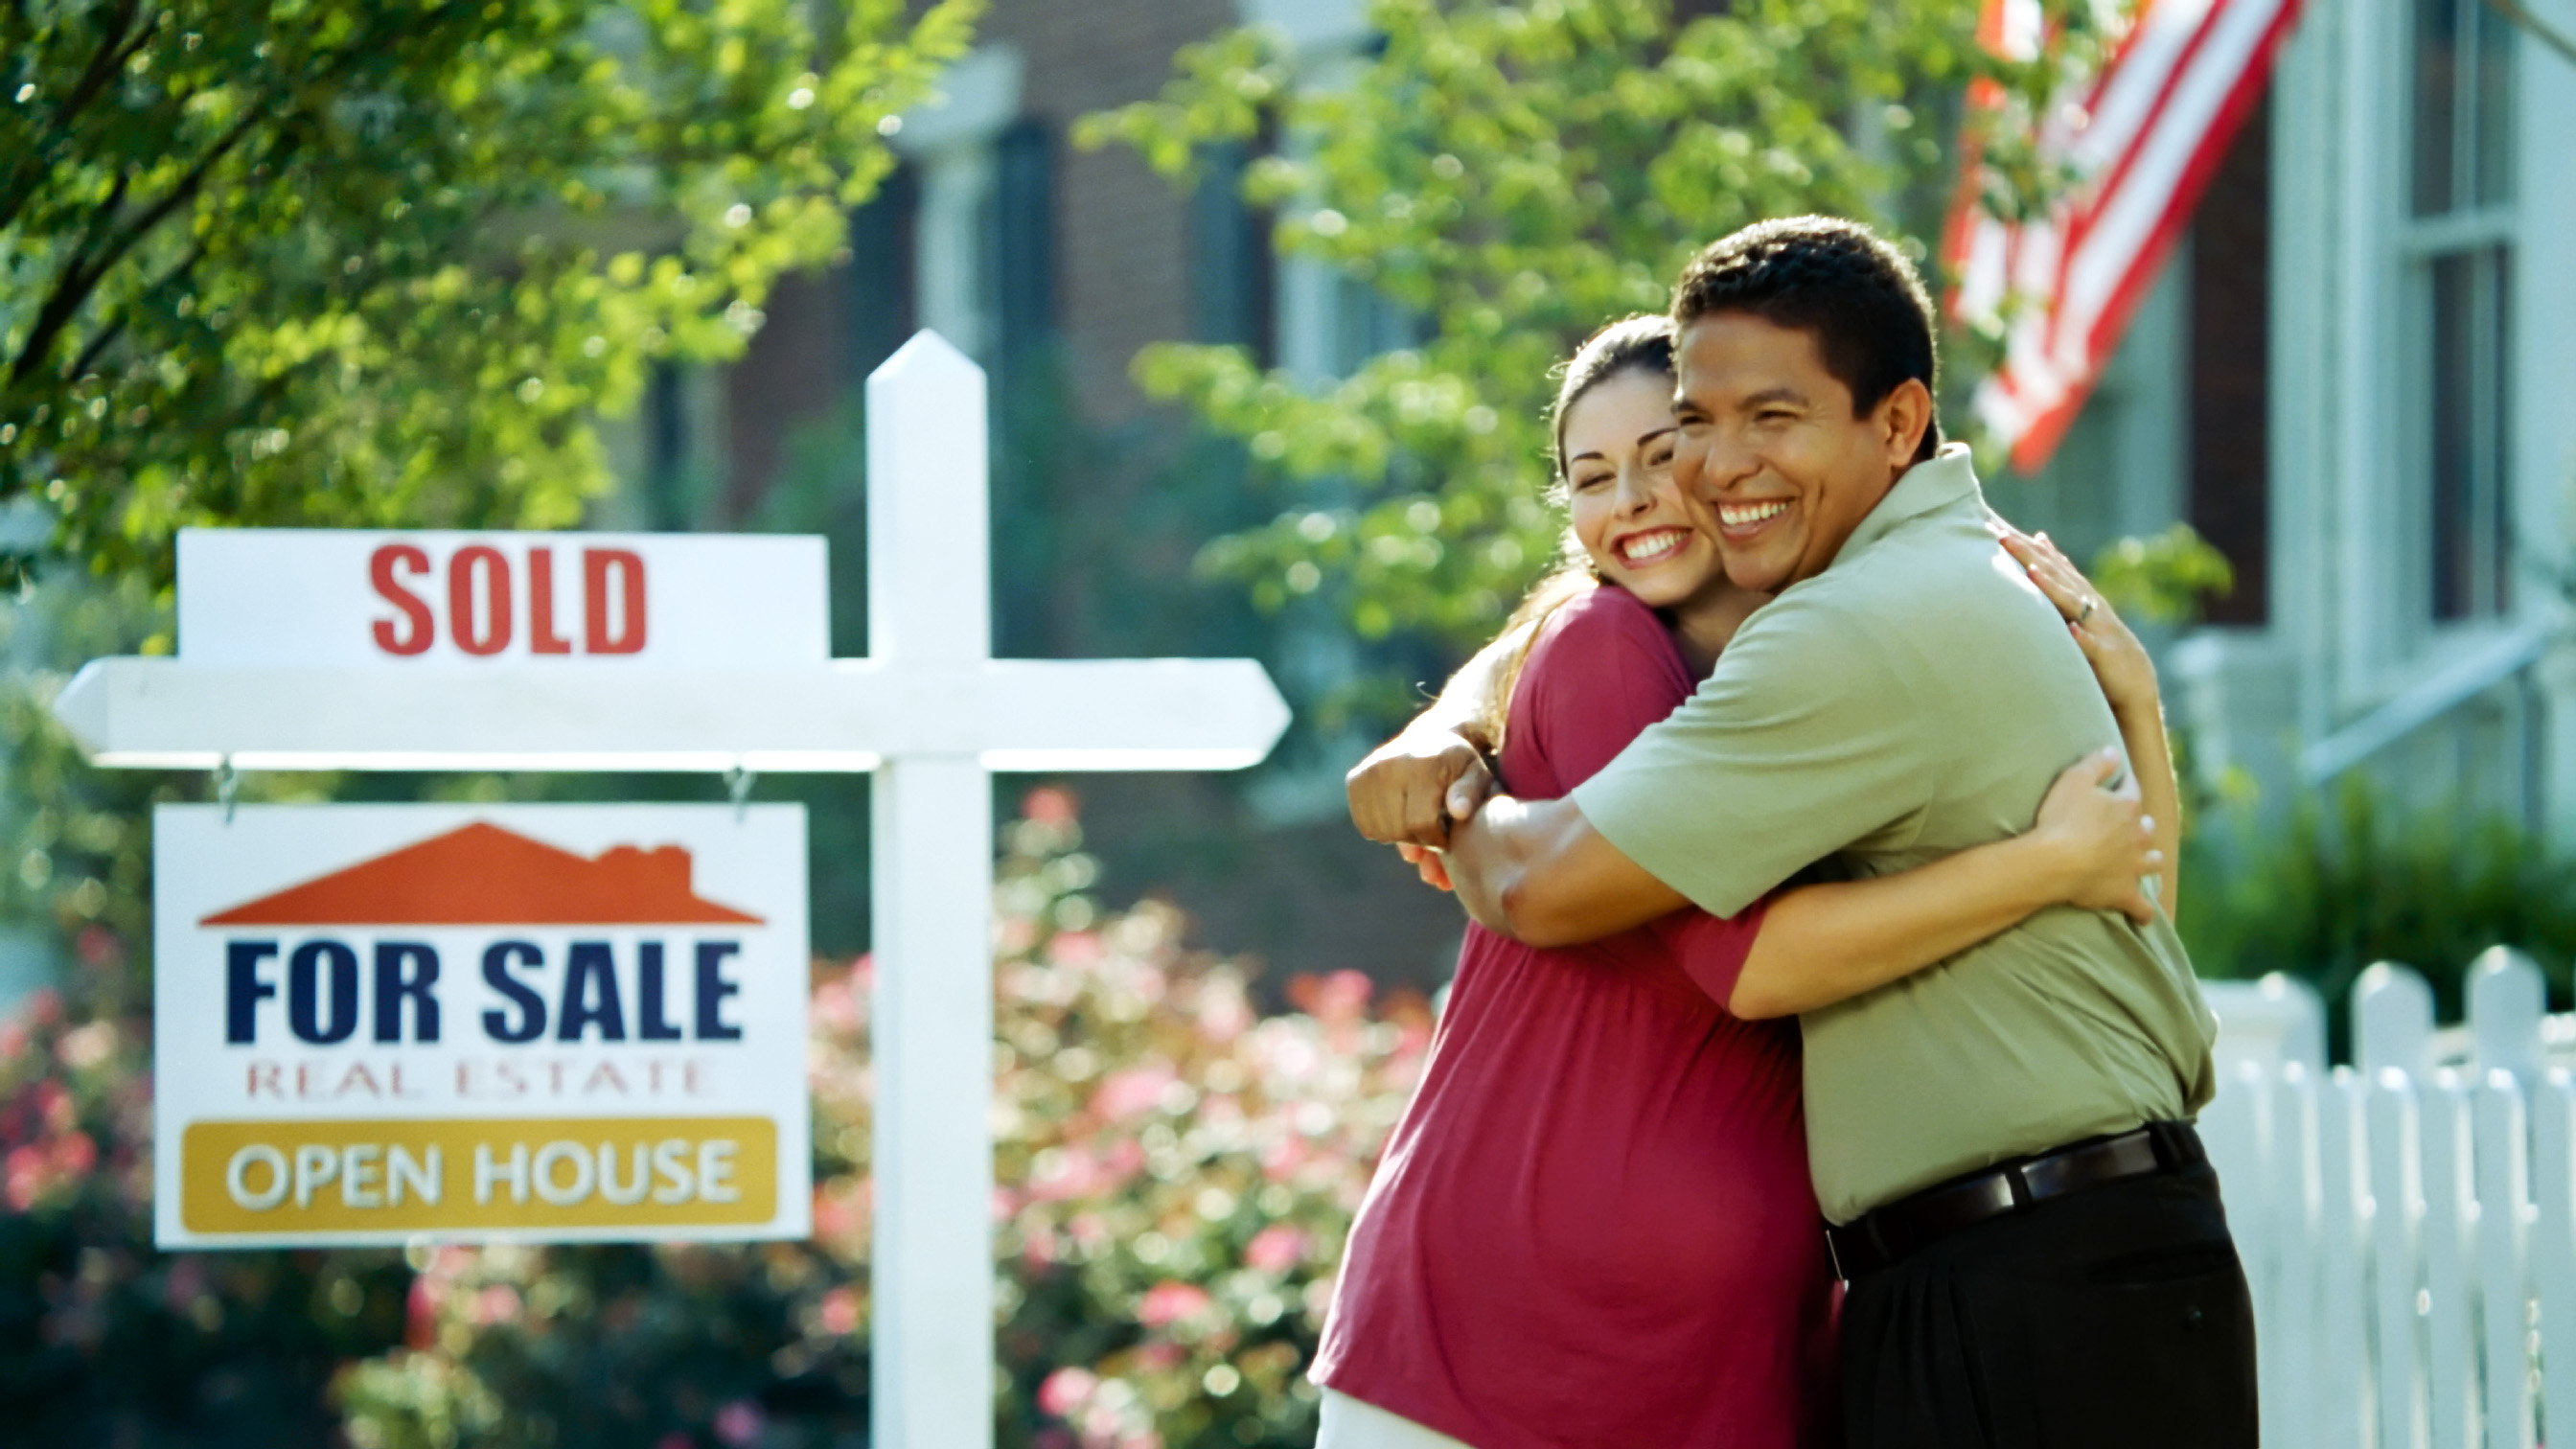 Lynda Hawkins Homes, LLC - Keller Williams Realty Atlanta Partners